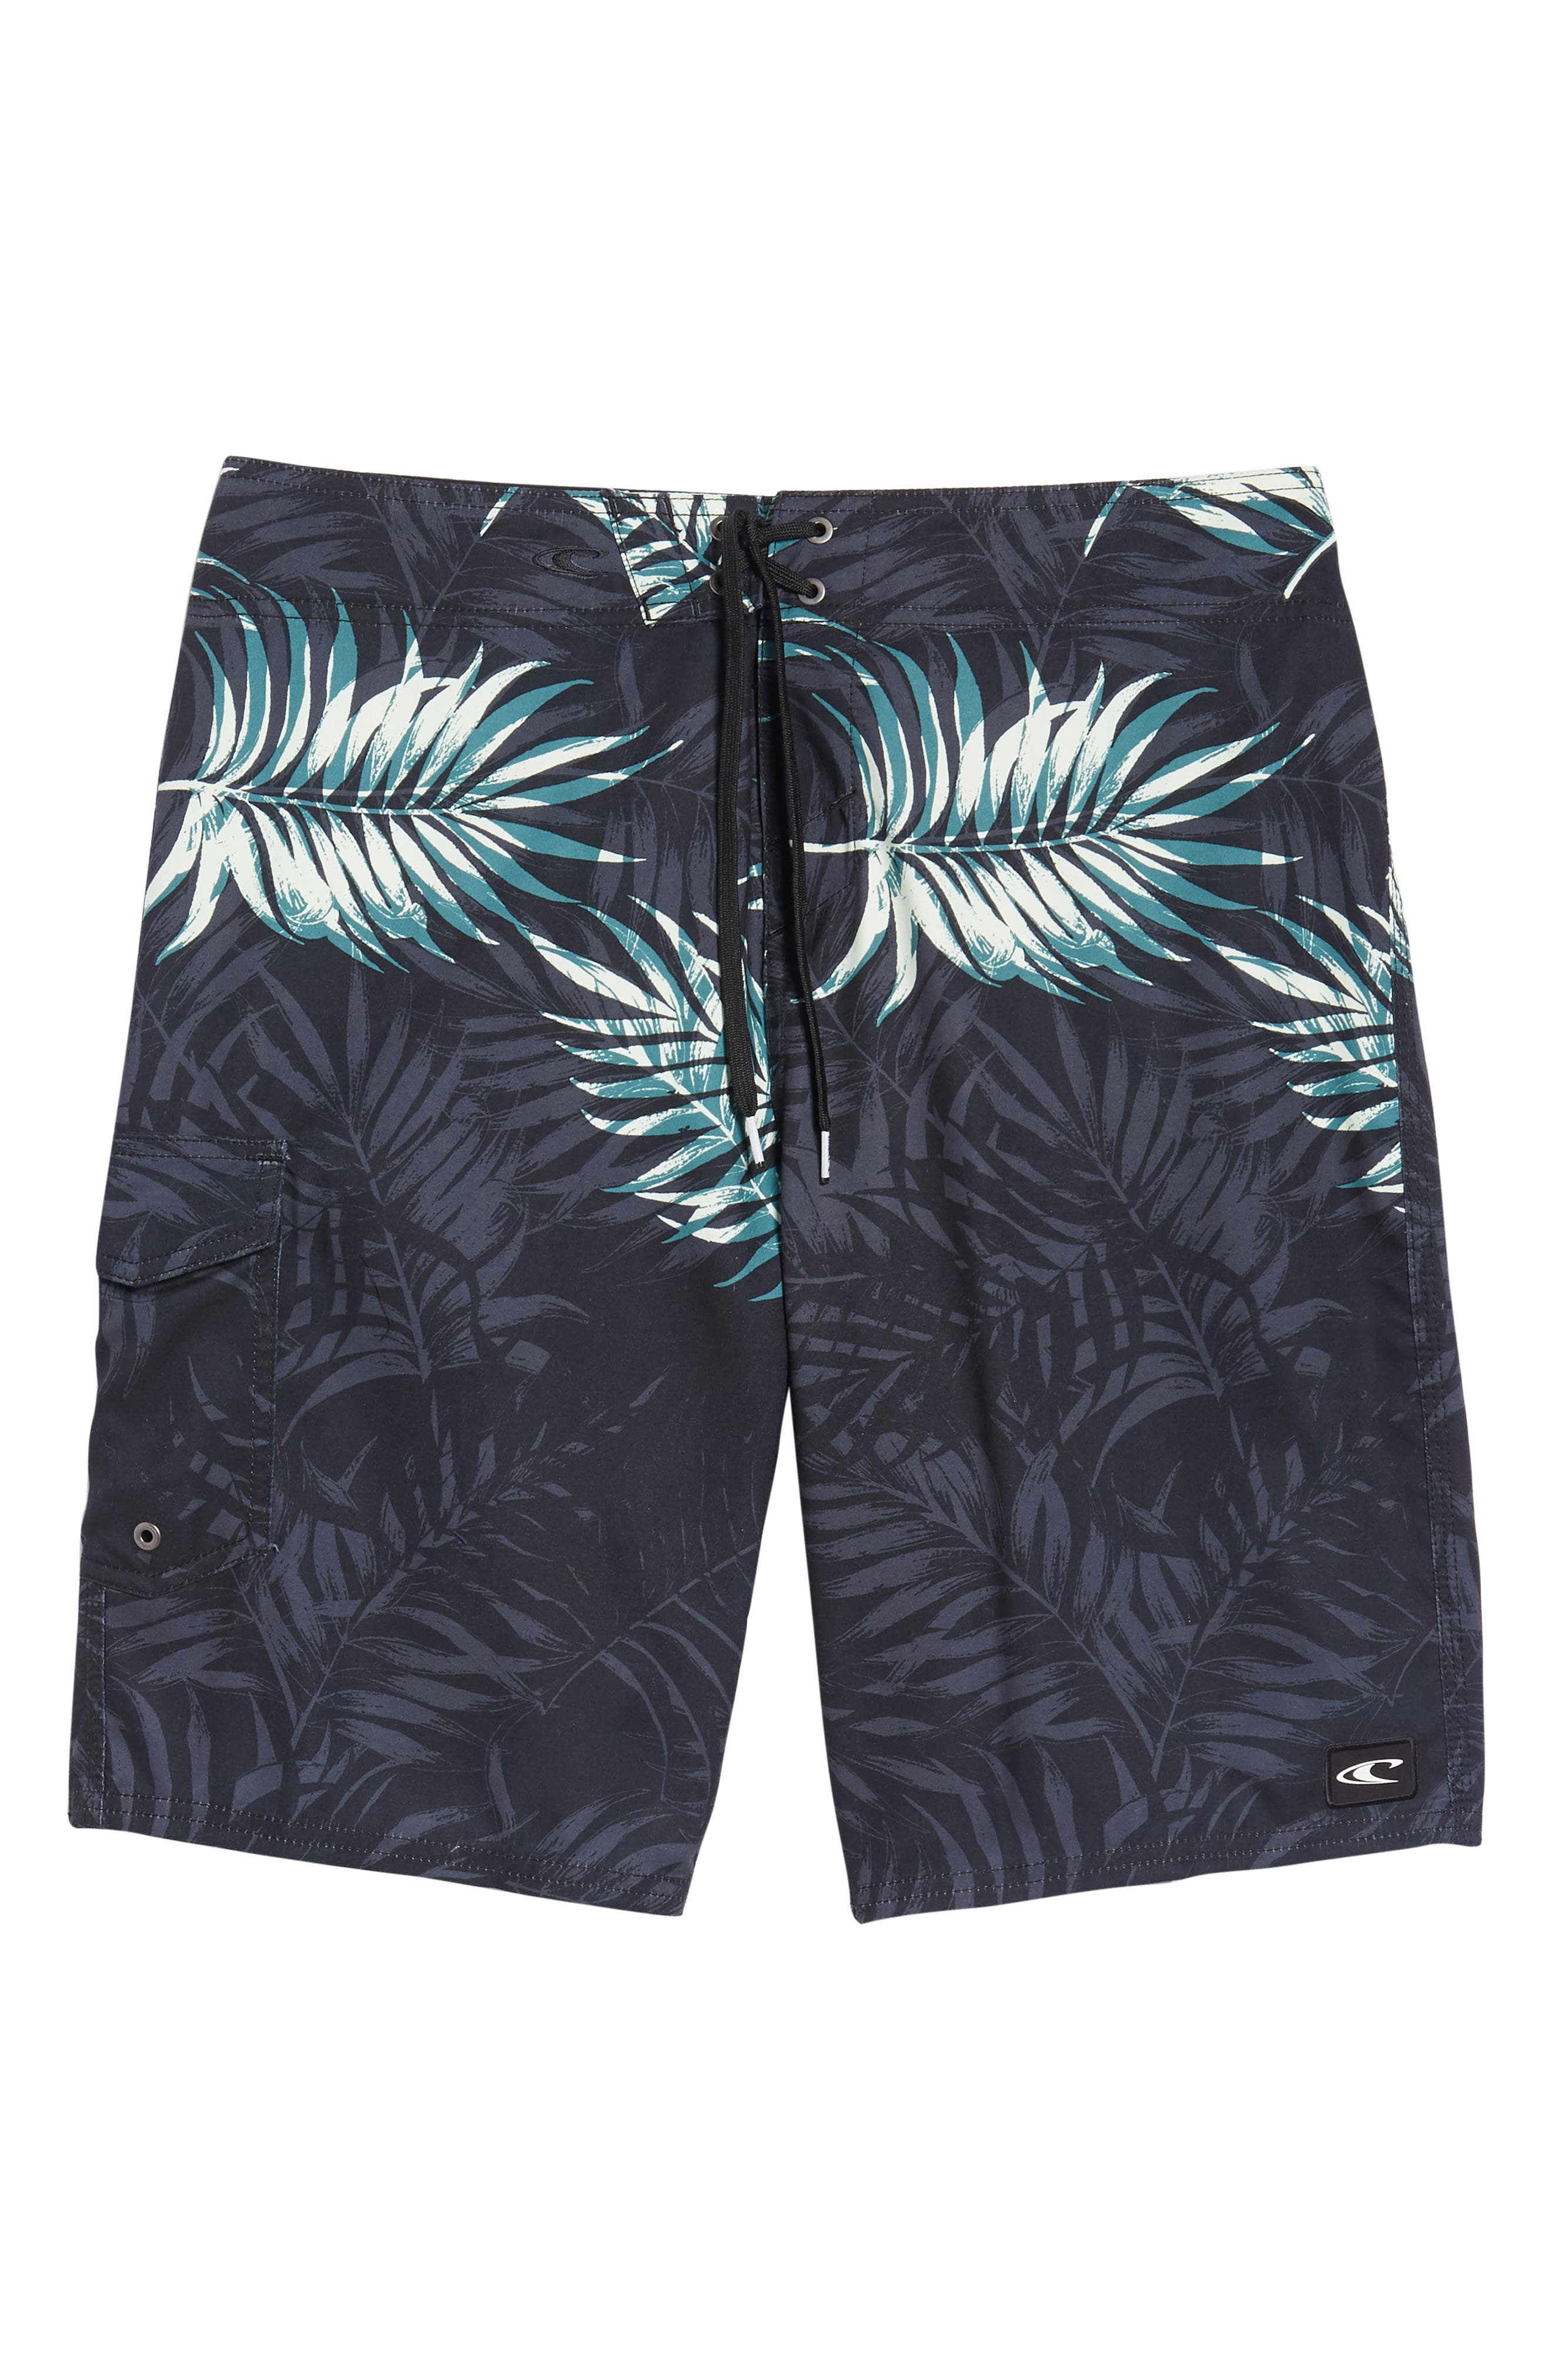 Santa Cruz Board Shorts,                             Alternate thumbnail 6, color,                             001